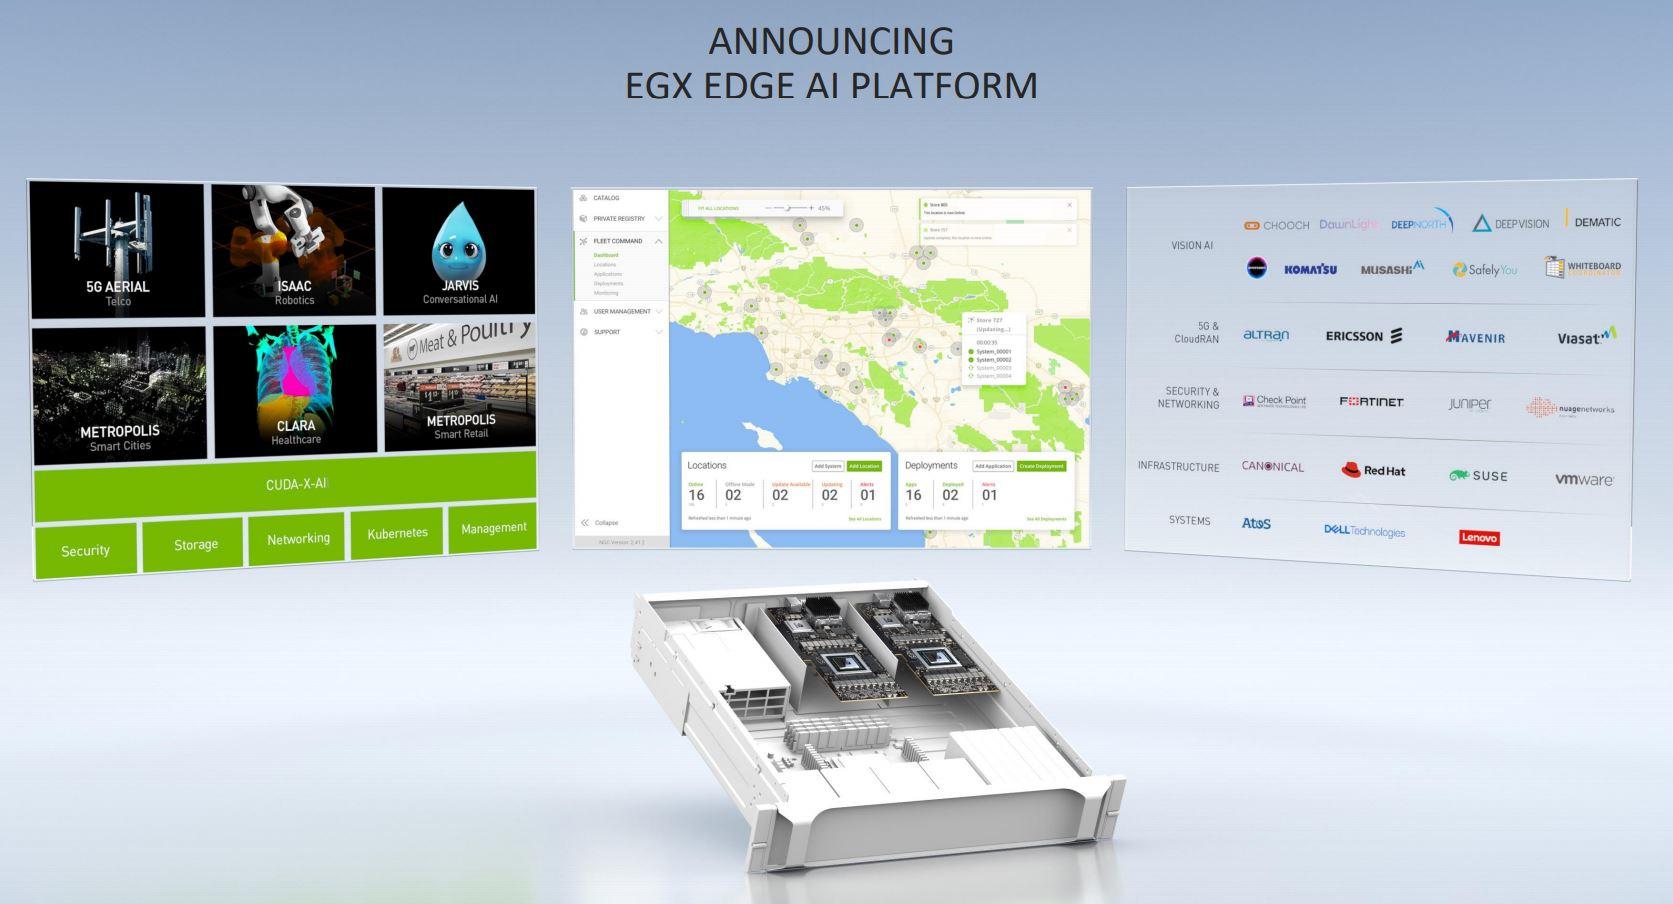 NVIDIA BlueField 3X And BlueField 4 DPU Roadmap Zoom